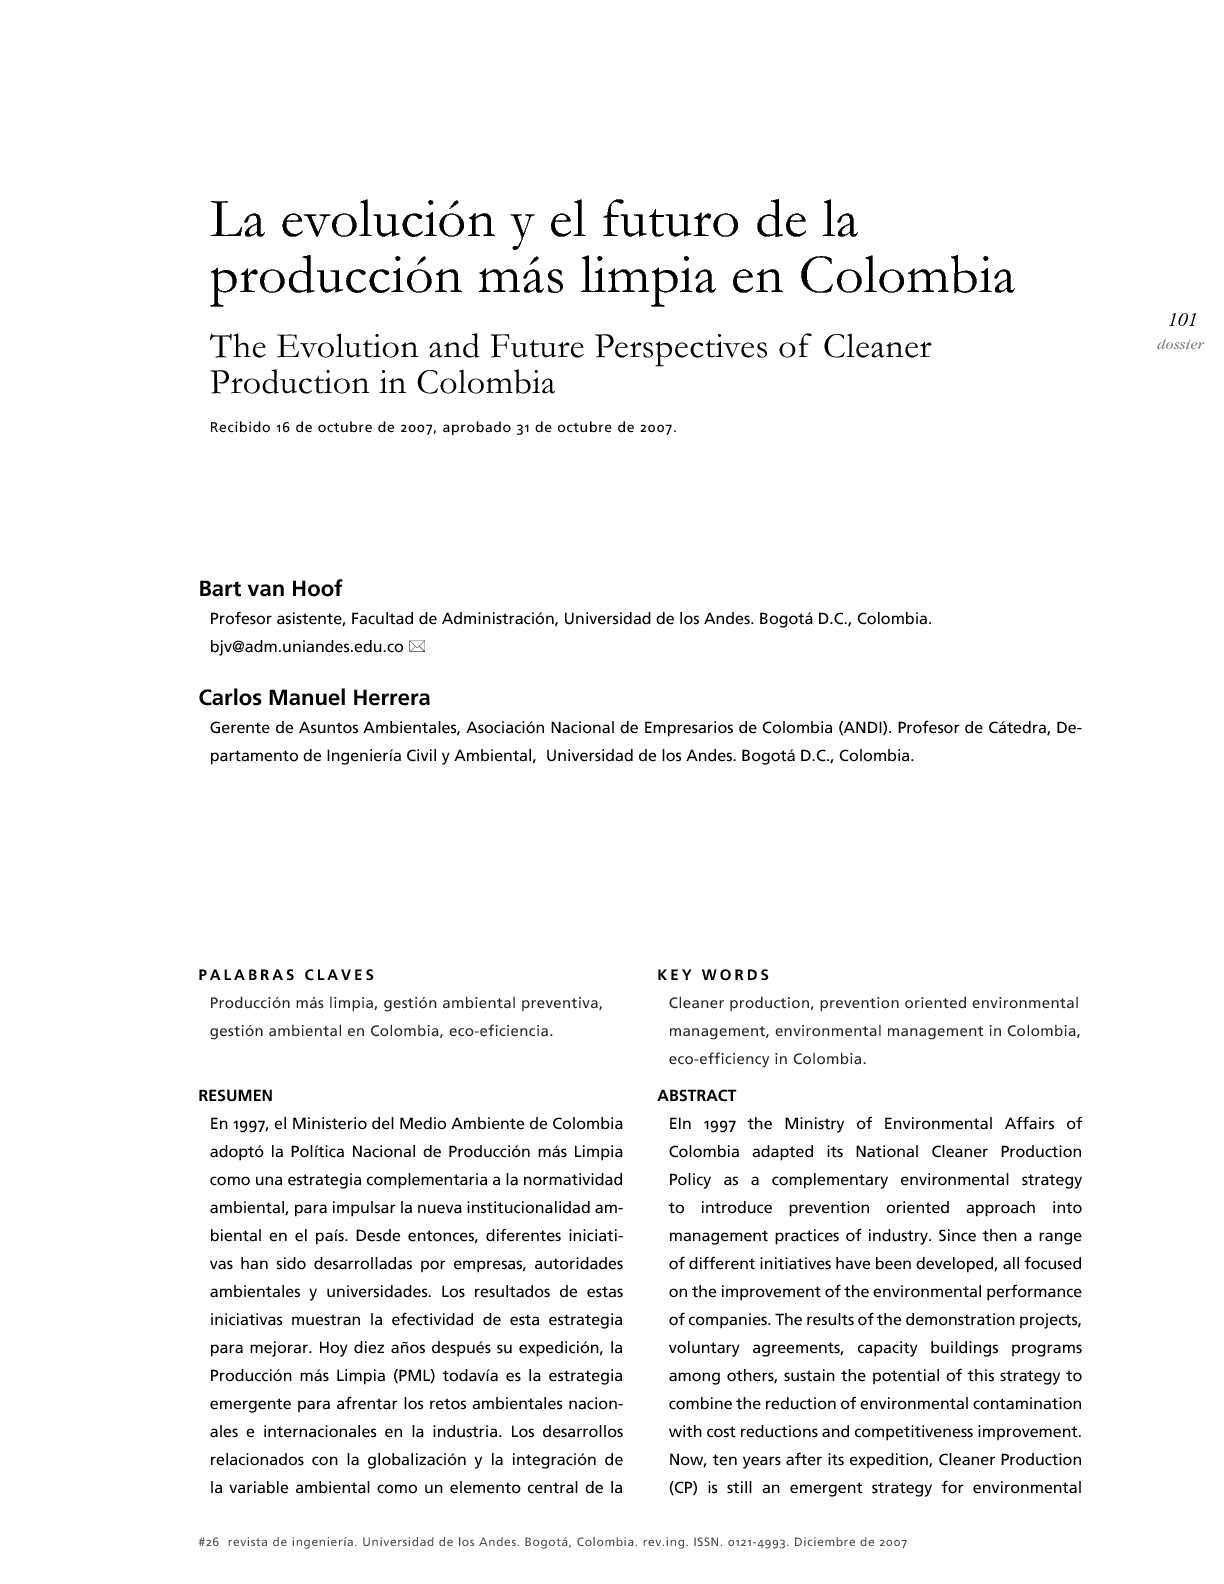 Calaméo - PML COLOMBIA